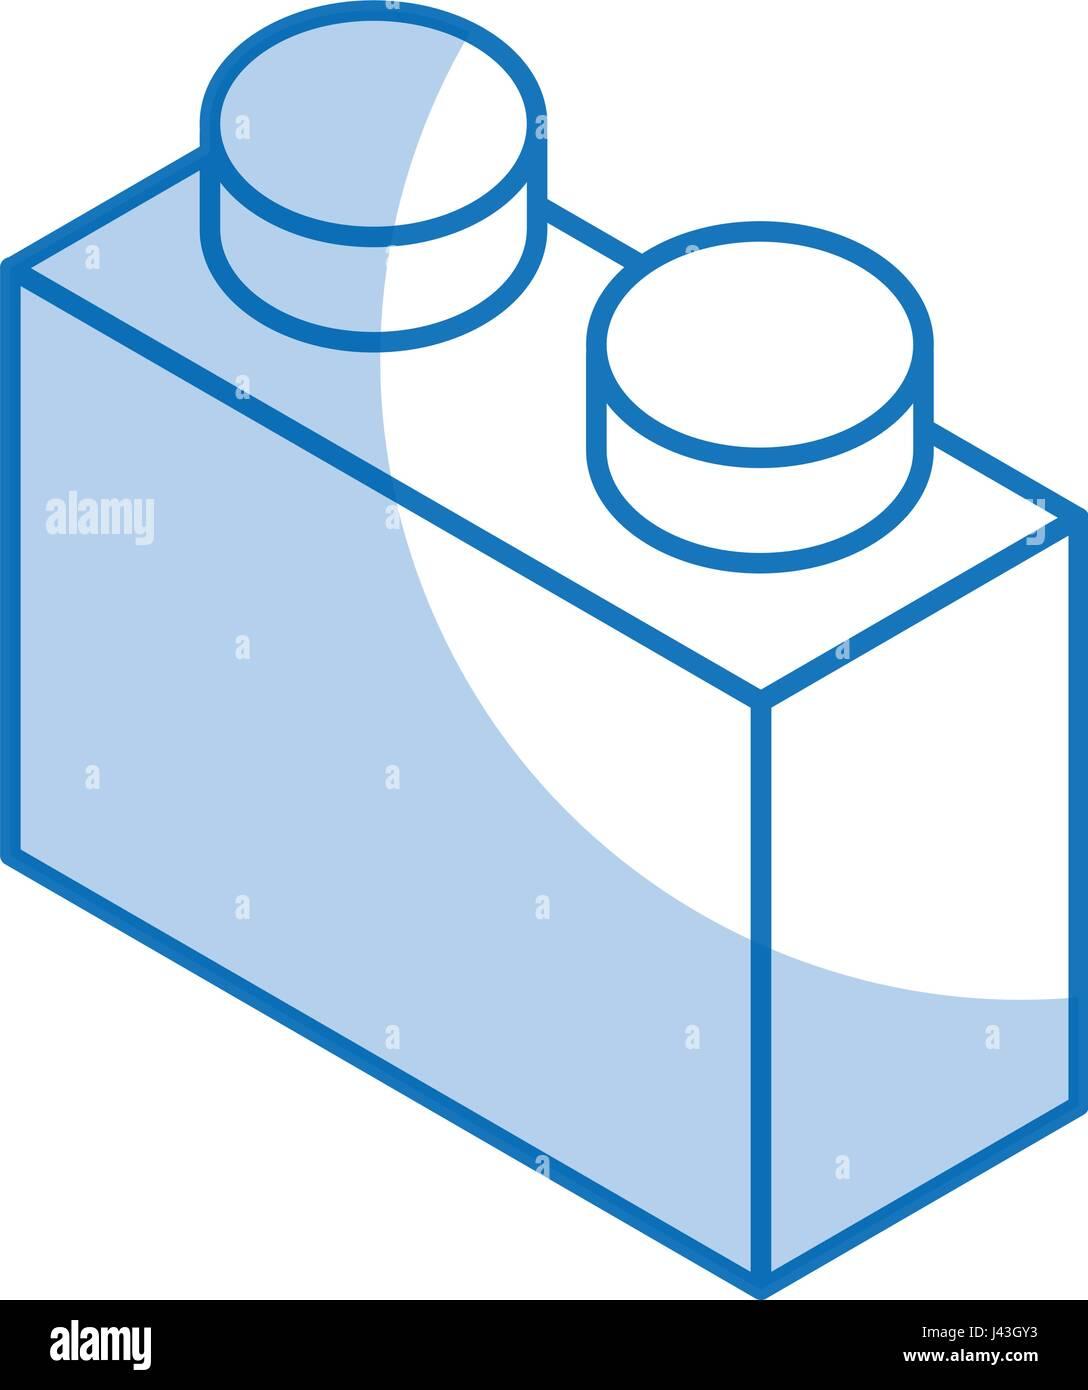 isometric block game piece - Stock Image